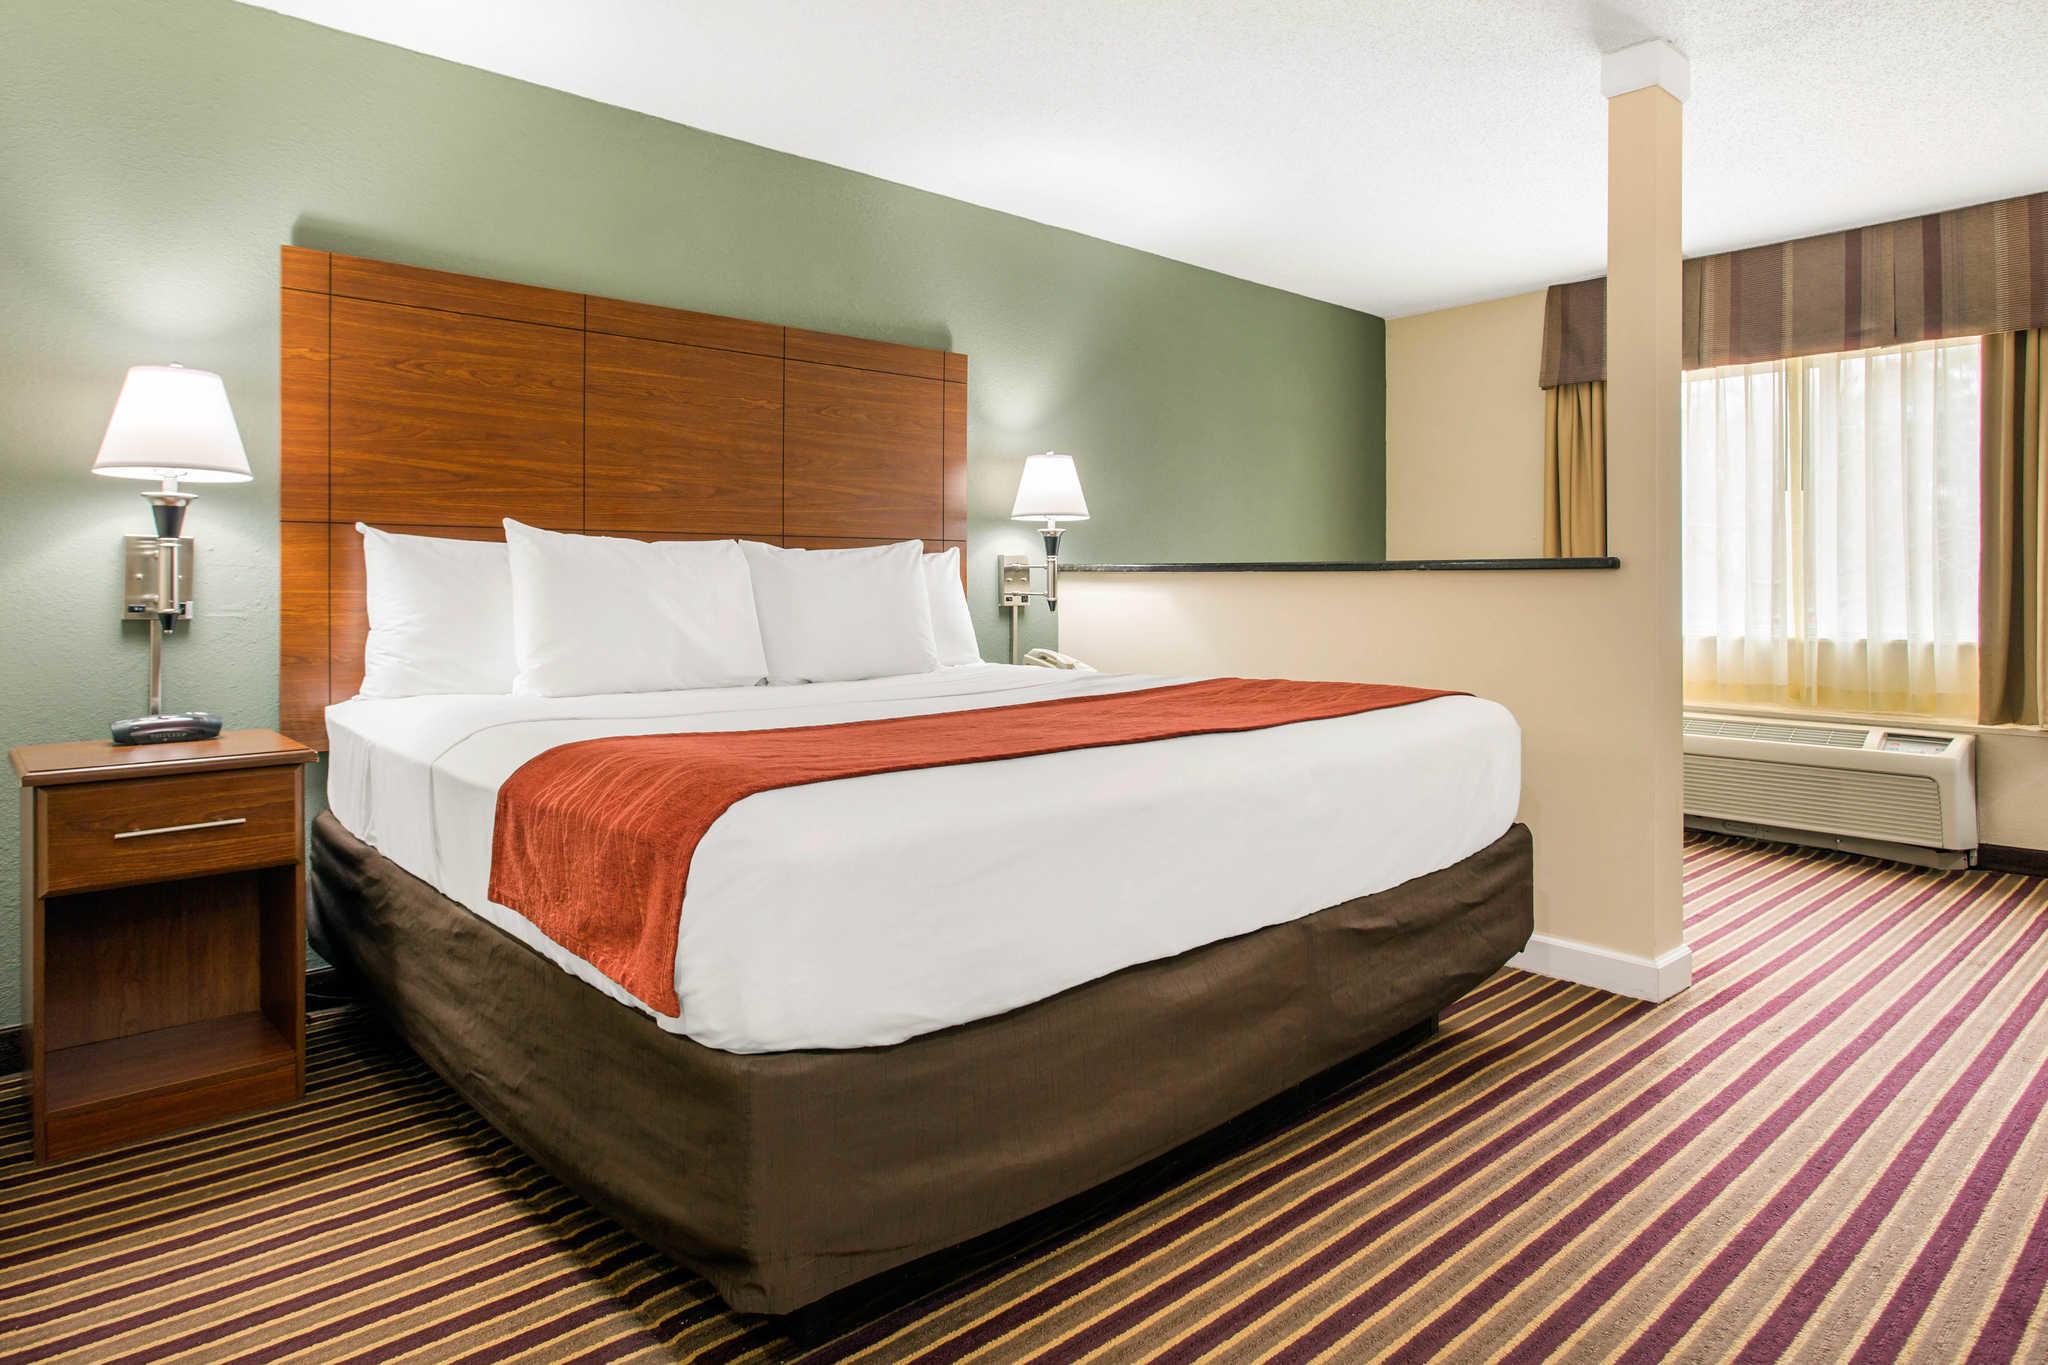 Comfort Inn & Suites Crabtree Valley image 18